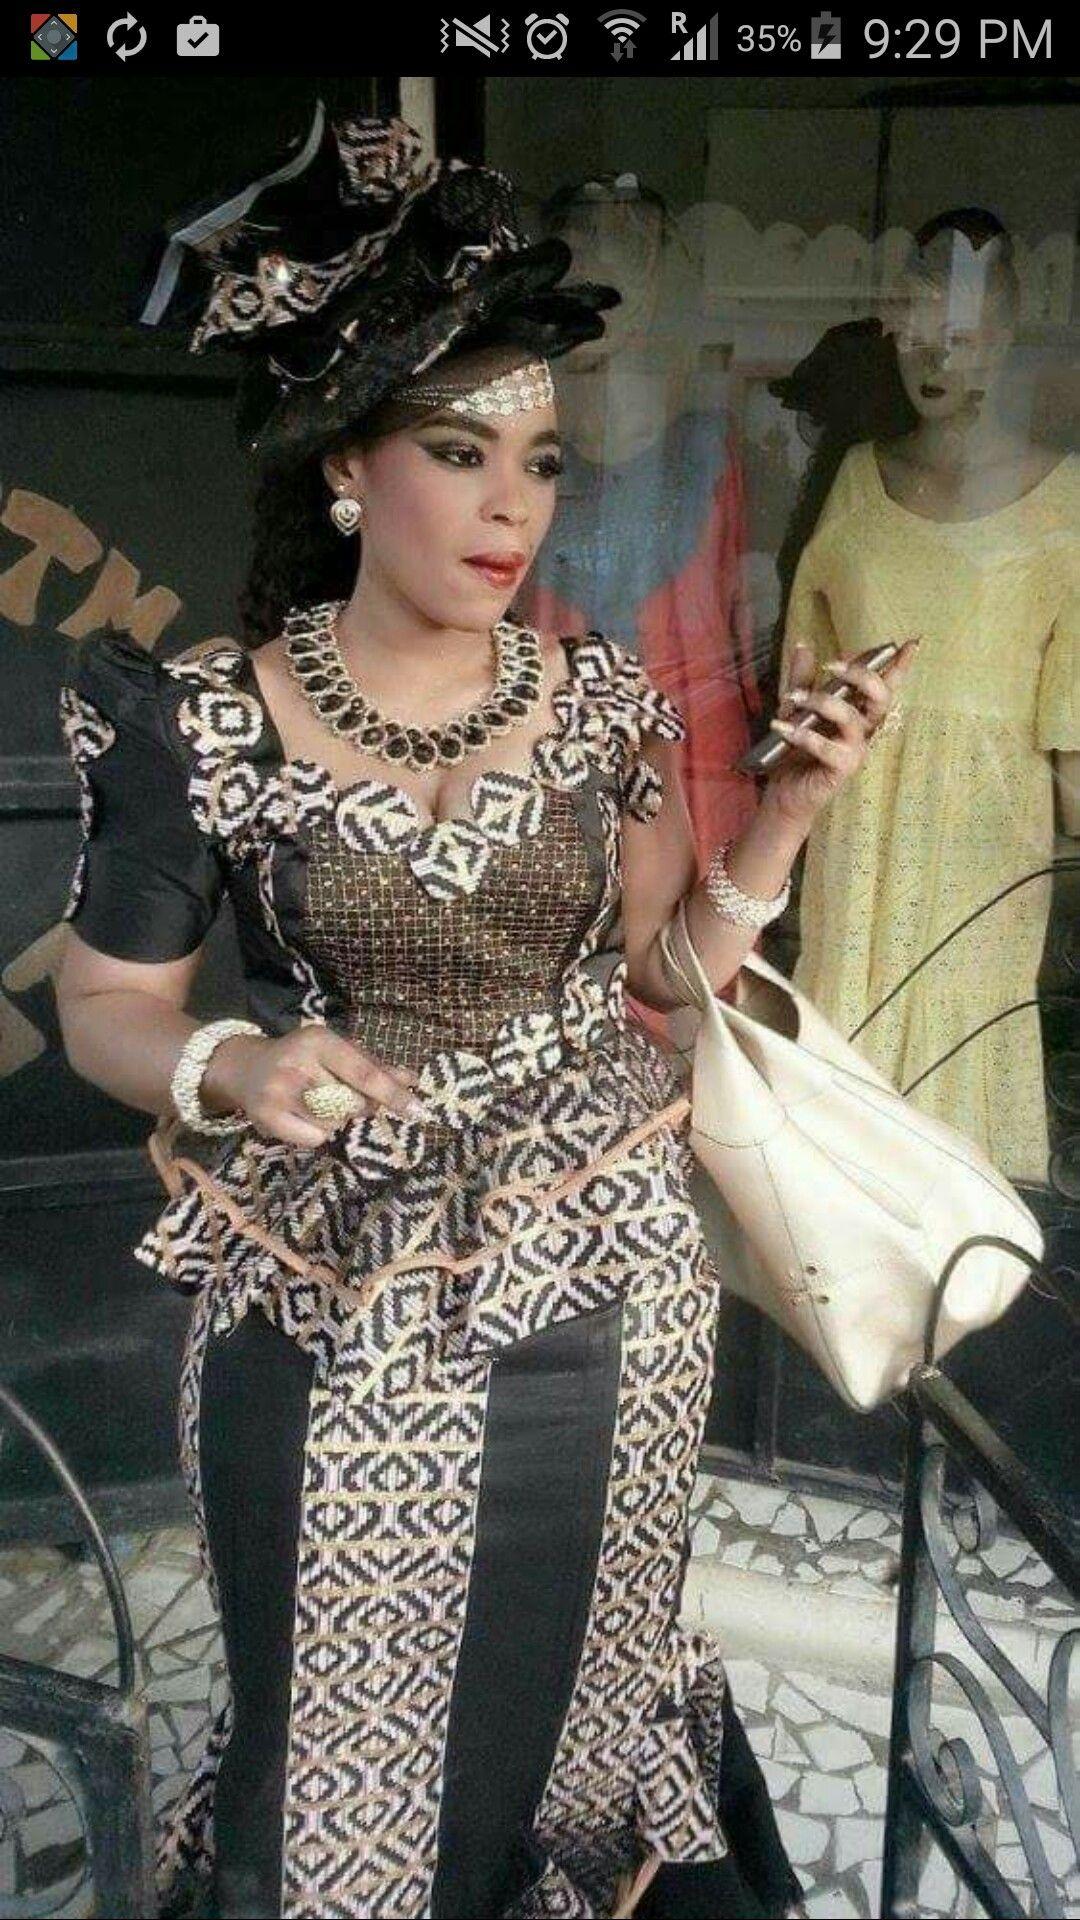 Épinglé par Fofana sur Fofana | Model pagne africain, Mode africaine robe et Modele tenue africaine